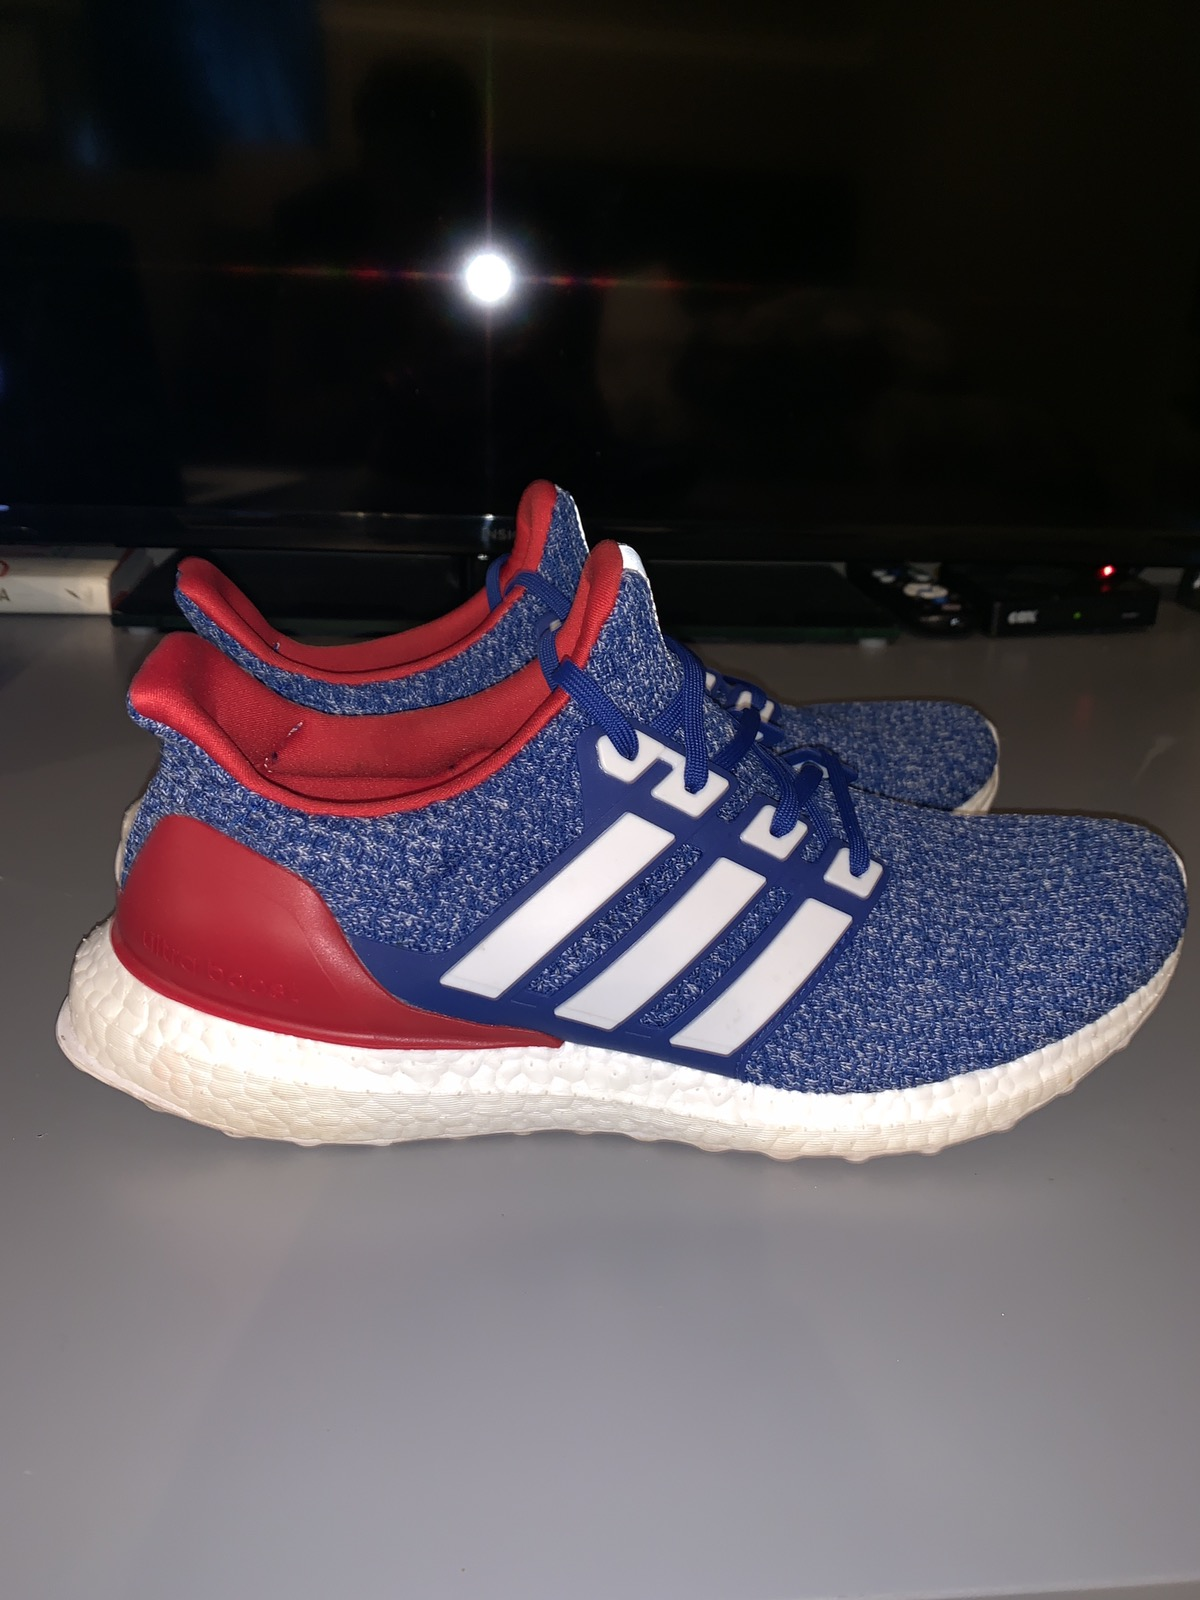 Adidas UltraBoost 4.0 USA